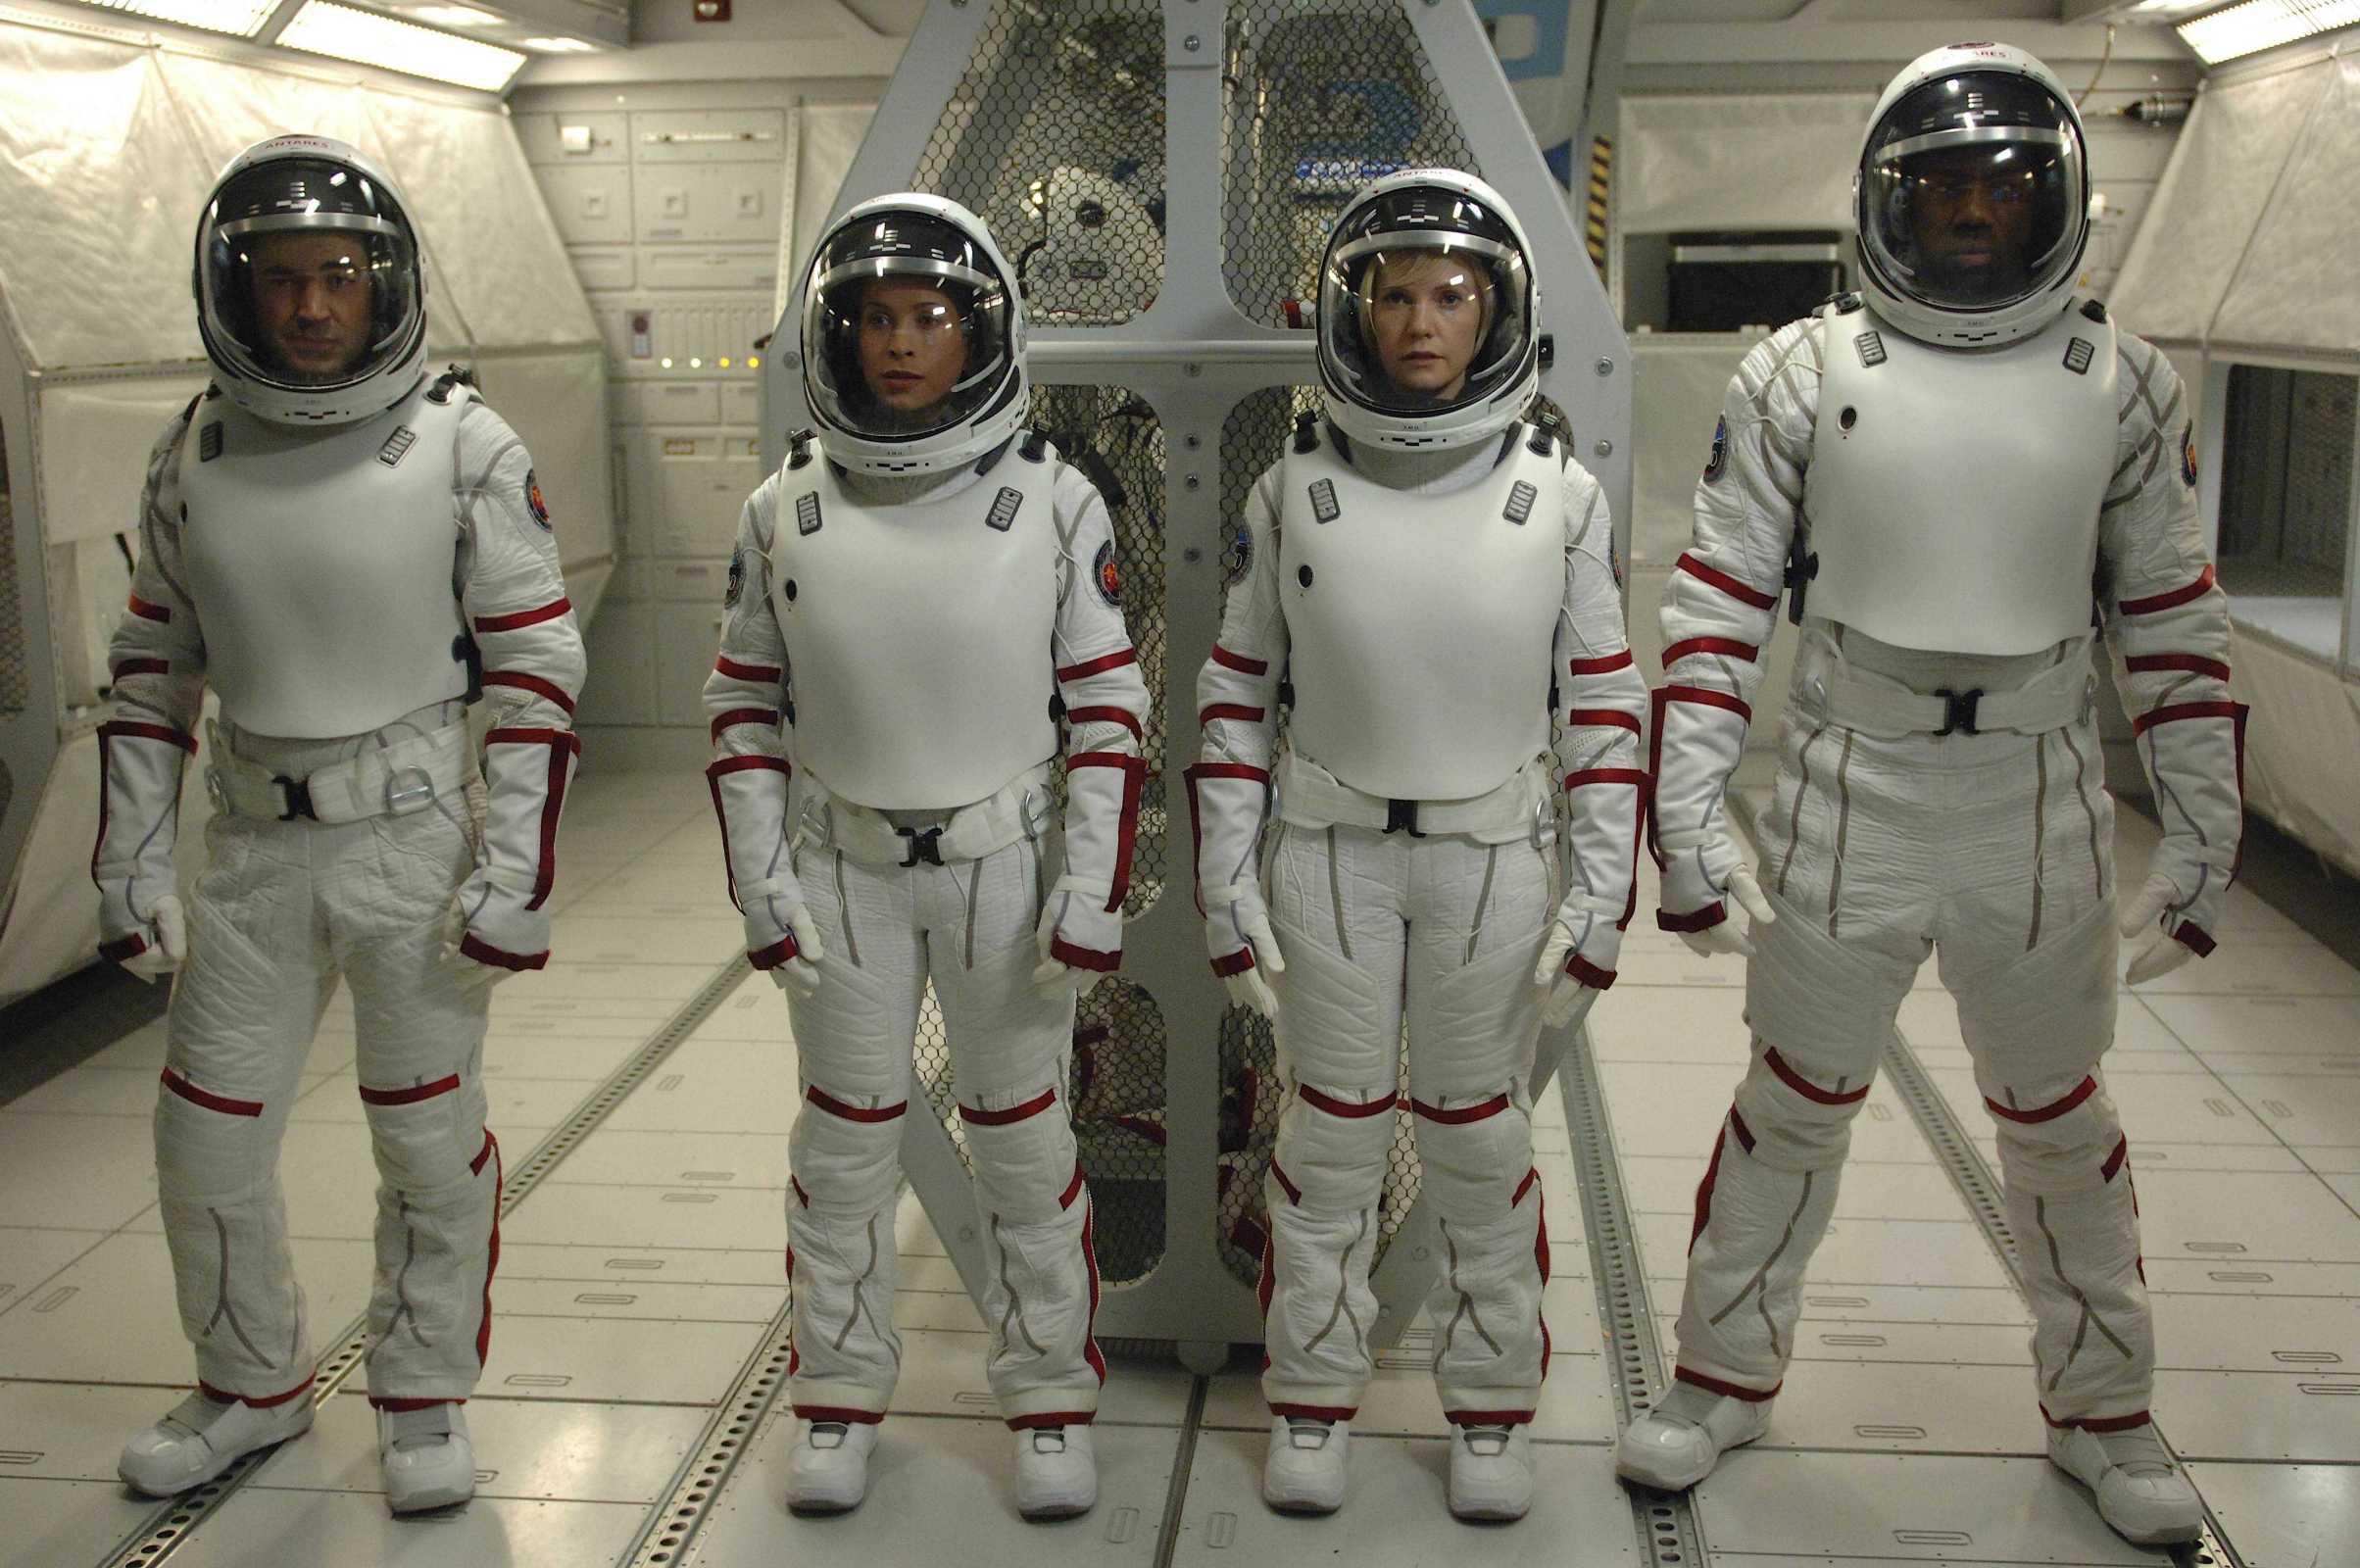 concept nasa space suits - photo #39